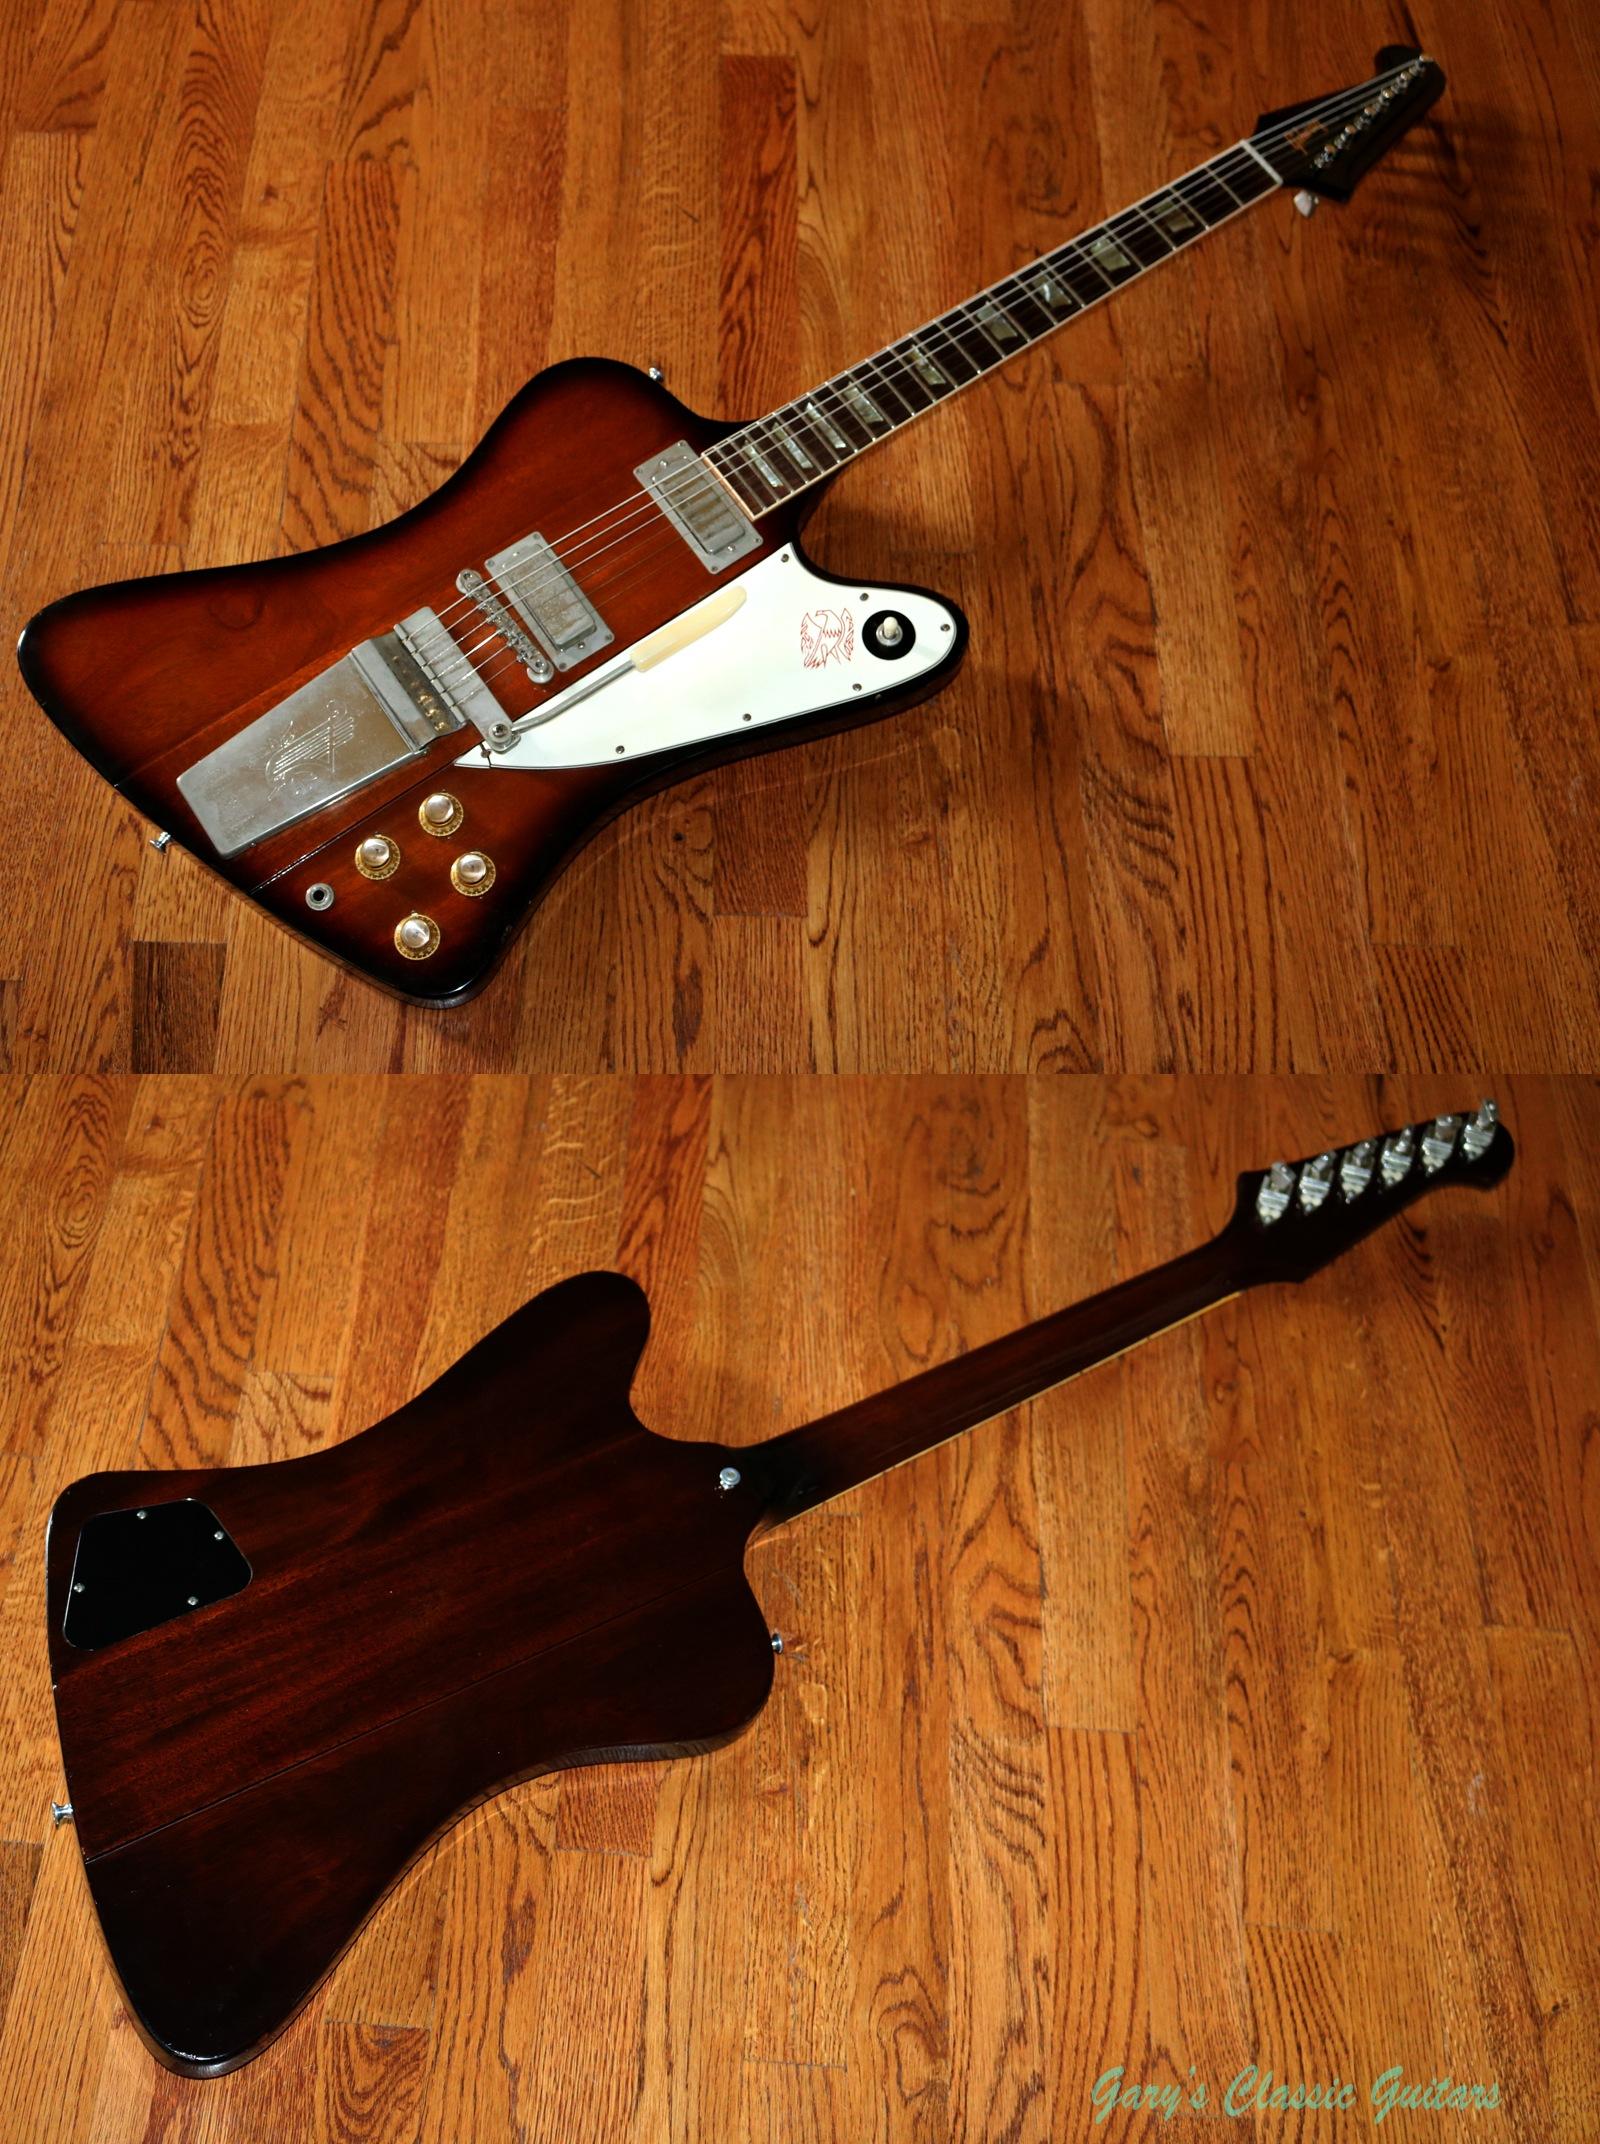 1964 gibson firebird v garys classic guitars vintage. Black Bedroom Furniture Sets. Home Design Ideas